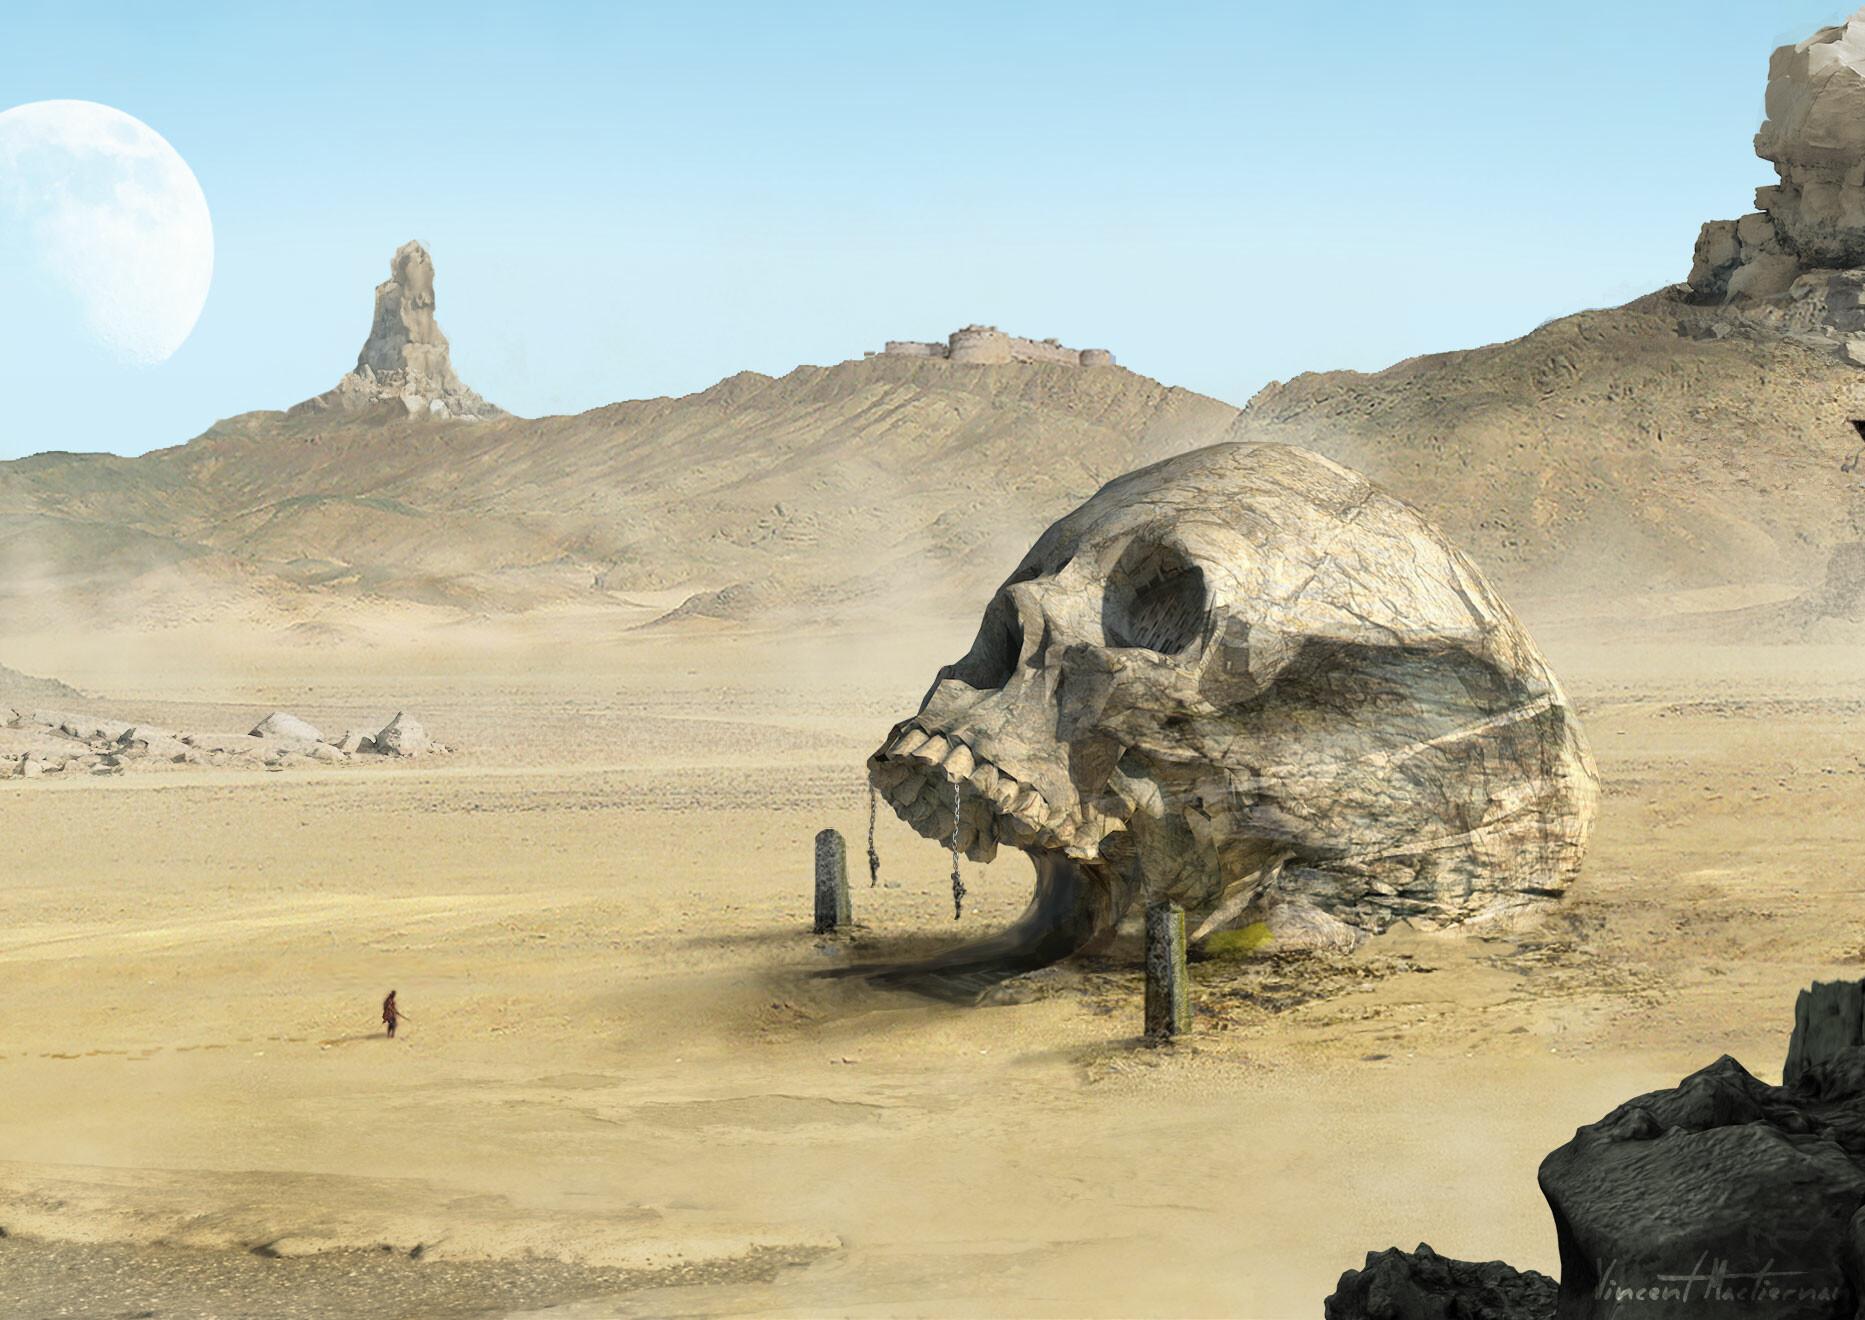 Vincent mactiernan desert skull v5 final2 2k